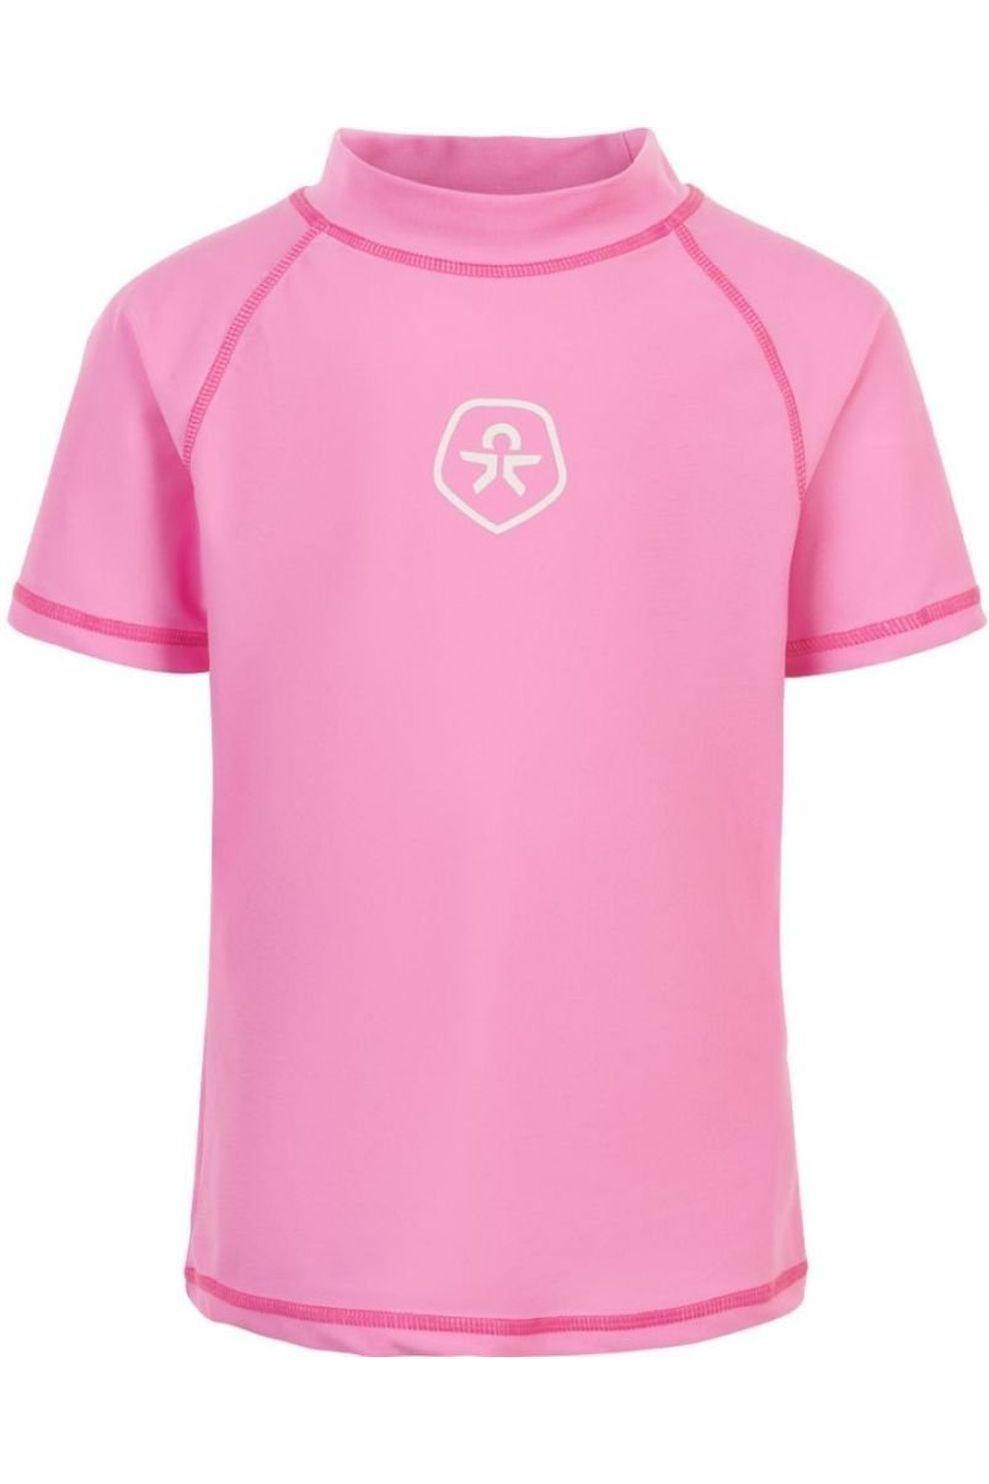 Color Kids Lycra Timon Ss Upf voor meisjes - Roze - Maten: 104, 116, 128, 140